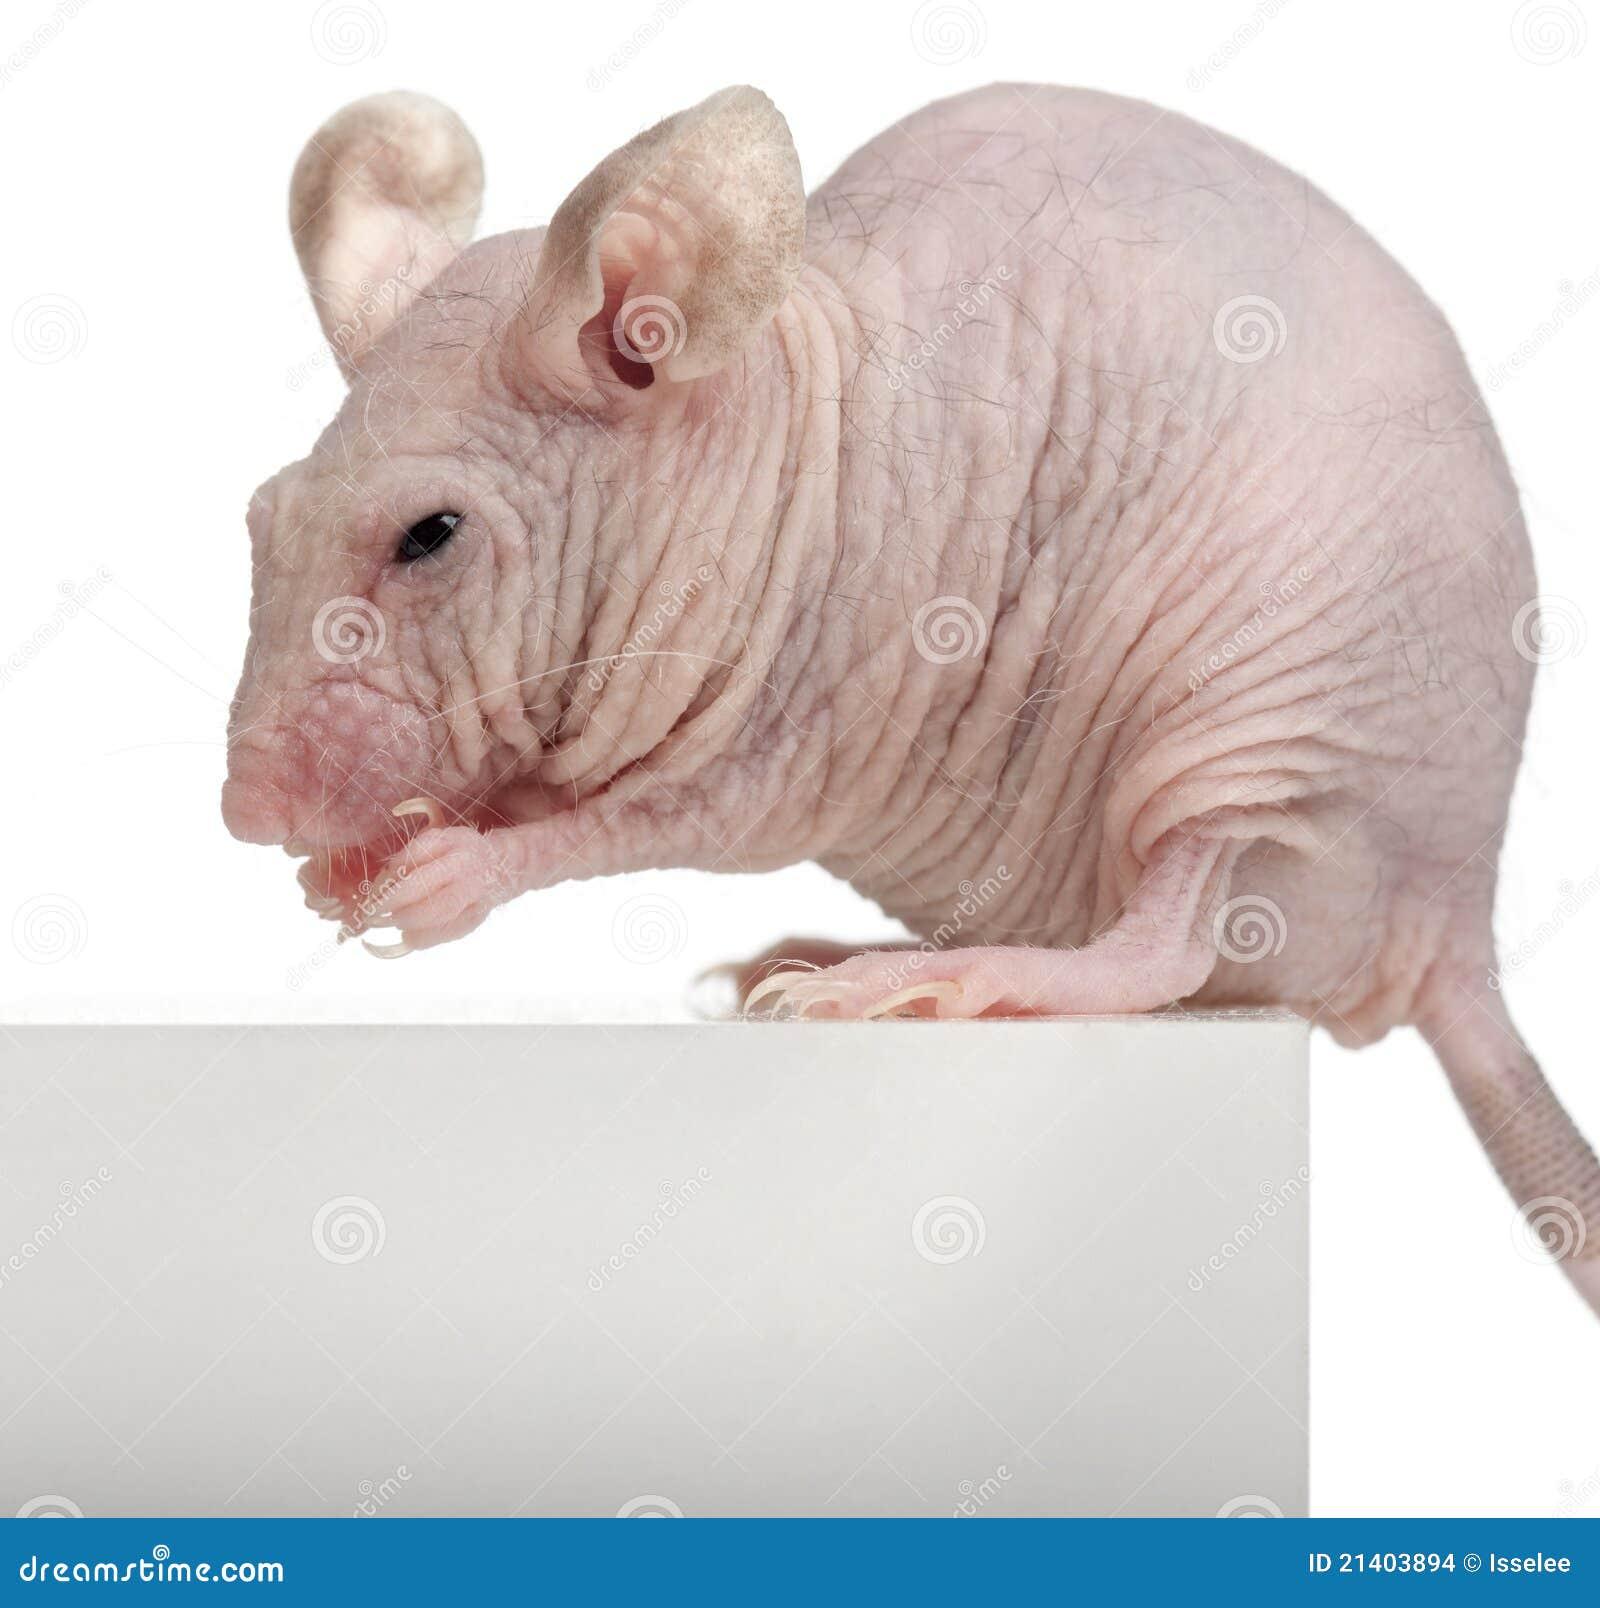 Rat n de casa sin pelo musculus de mus imagenes de archivo imagen 21403894 - Raton en casa ...